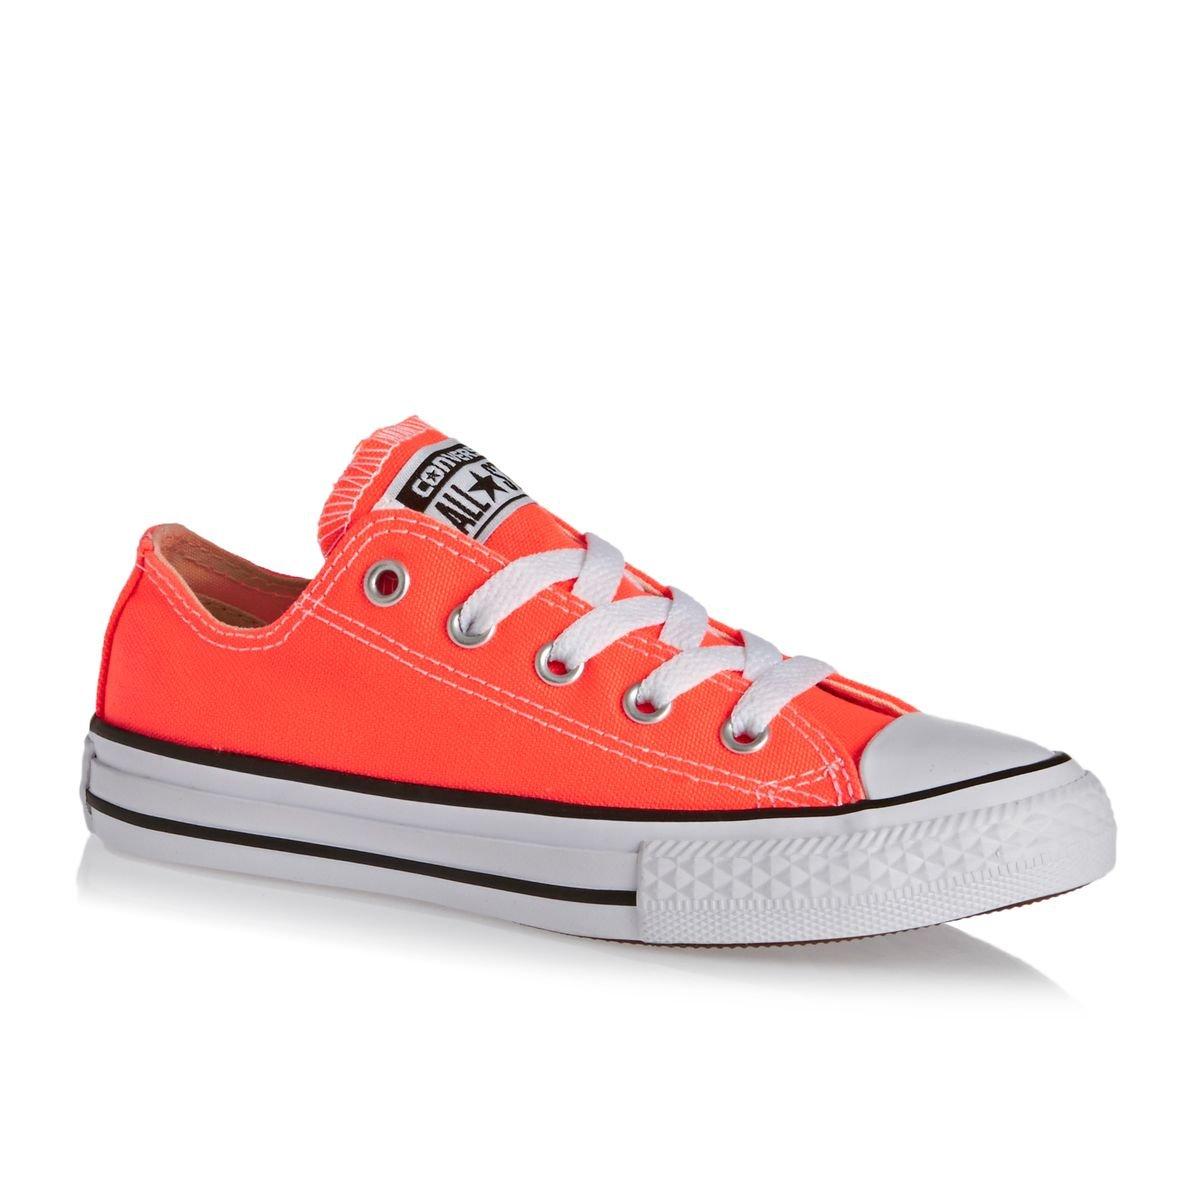 CONVERSE Designer Chucks Schuhe - ALL STAR -  31.5 EU|Hyper Orange